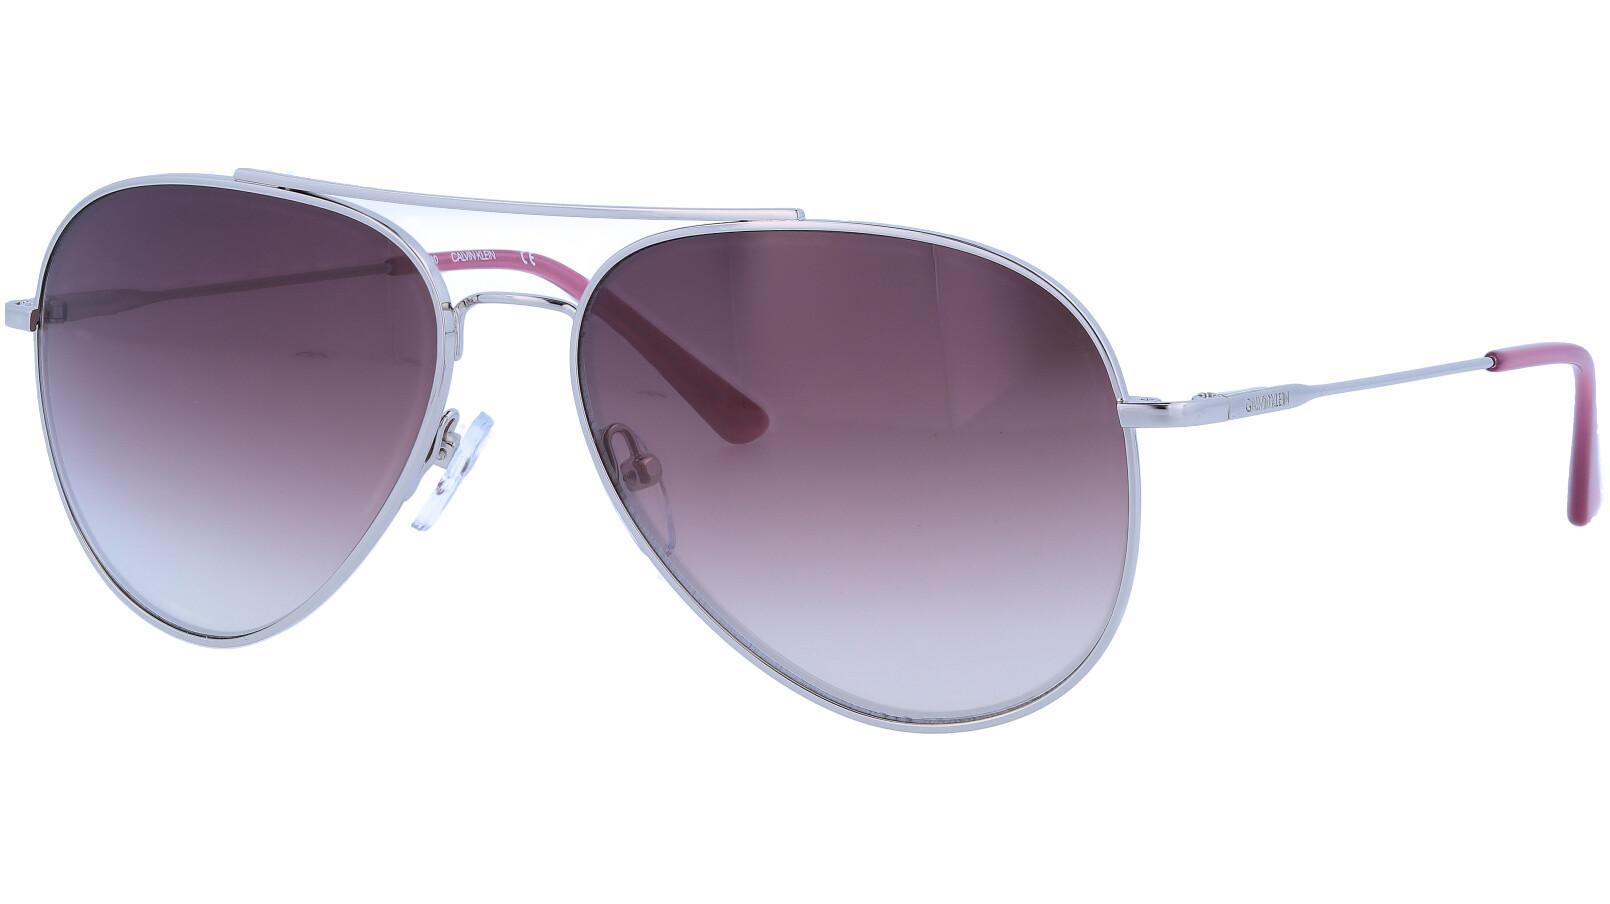 Calvin Klein CK18105S 046 59 Silver Sunglasses